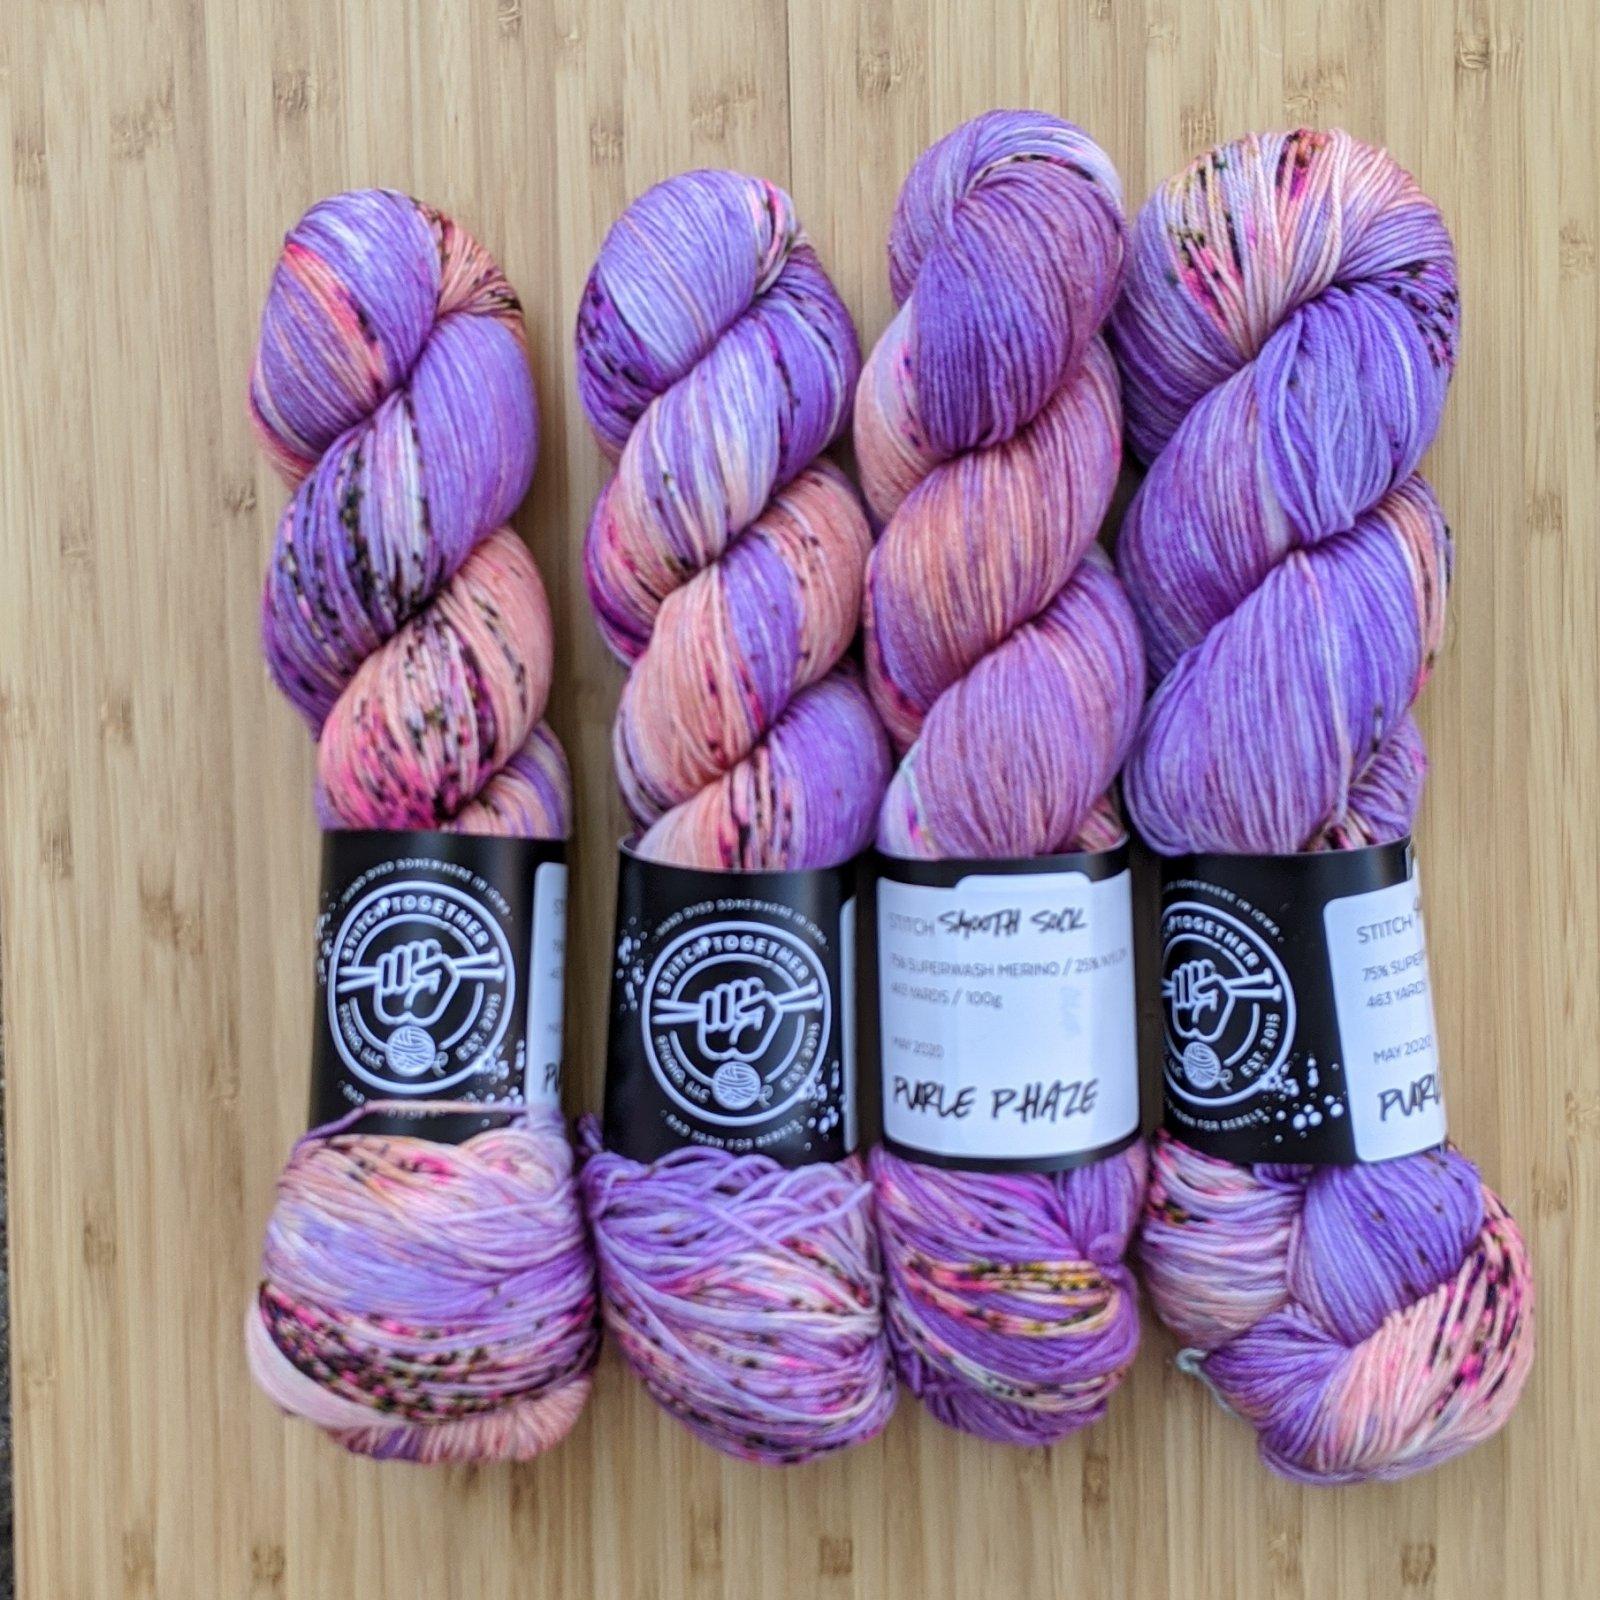 Stitch Smooth Fingering in Purple Phaze